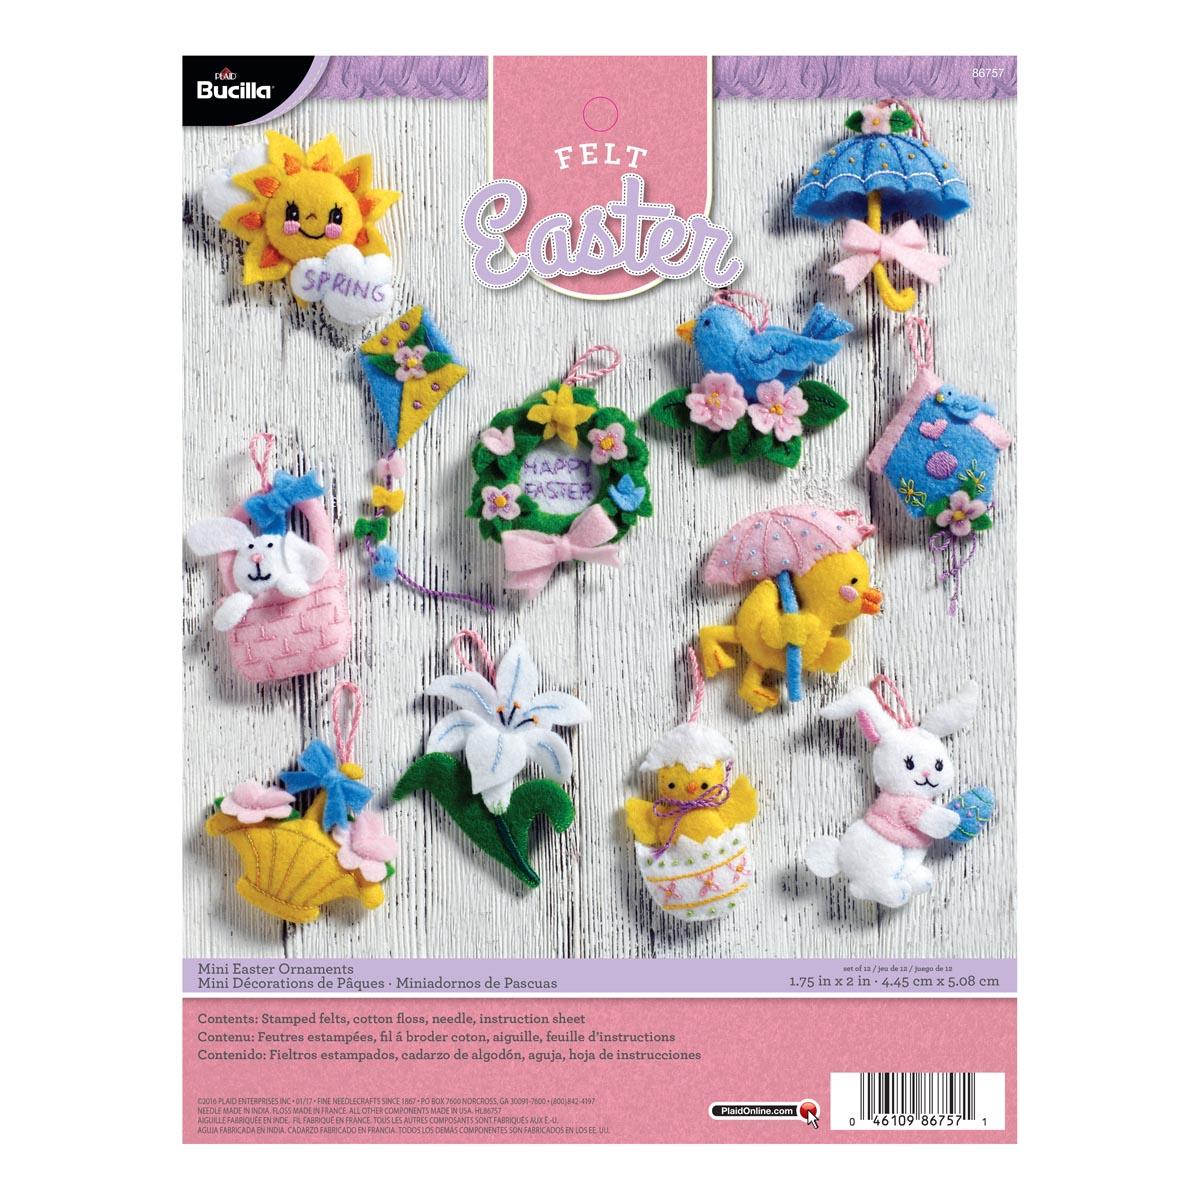 Bucilla ® Seasonal - Felt - Ornament Kits - Easter